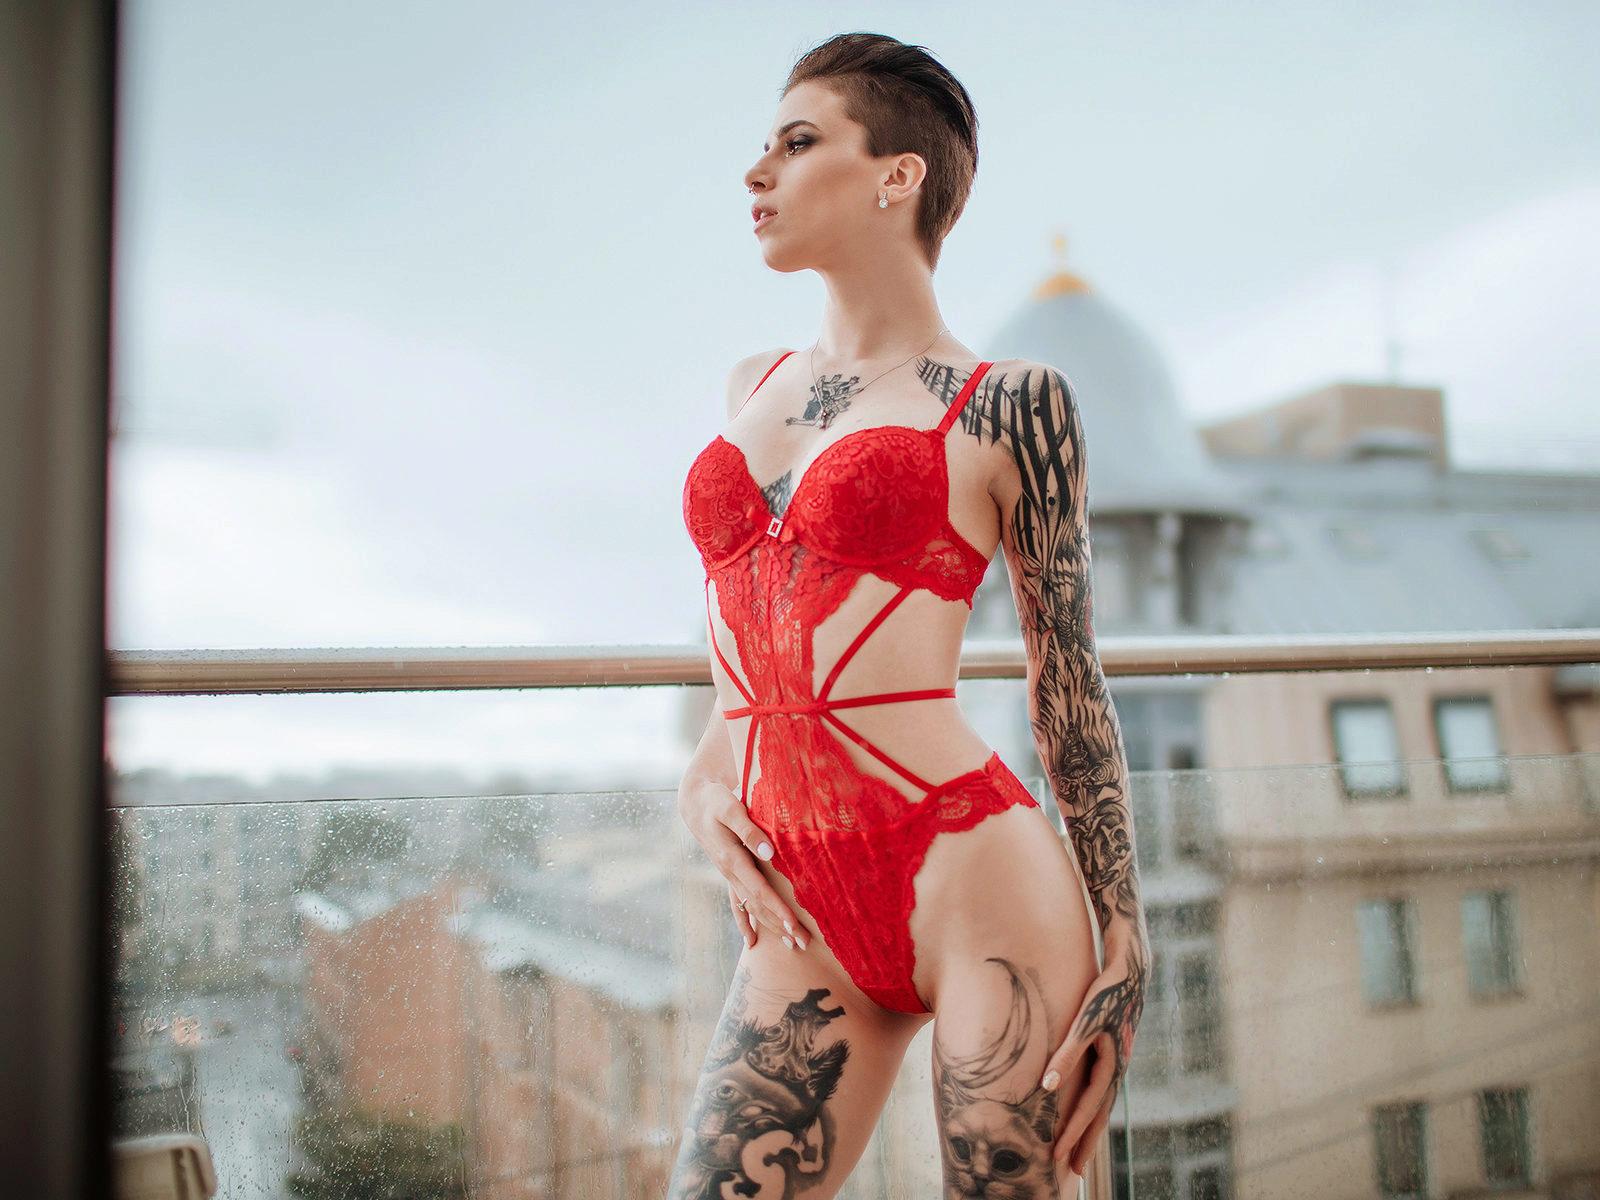 Arianna Mars